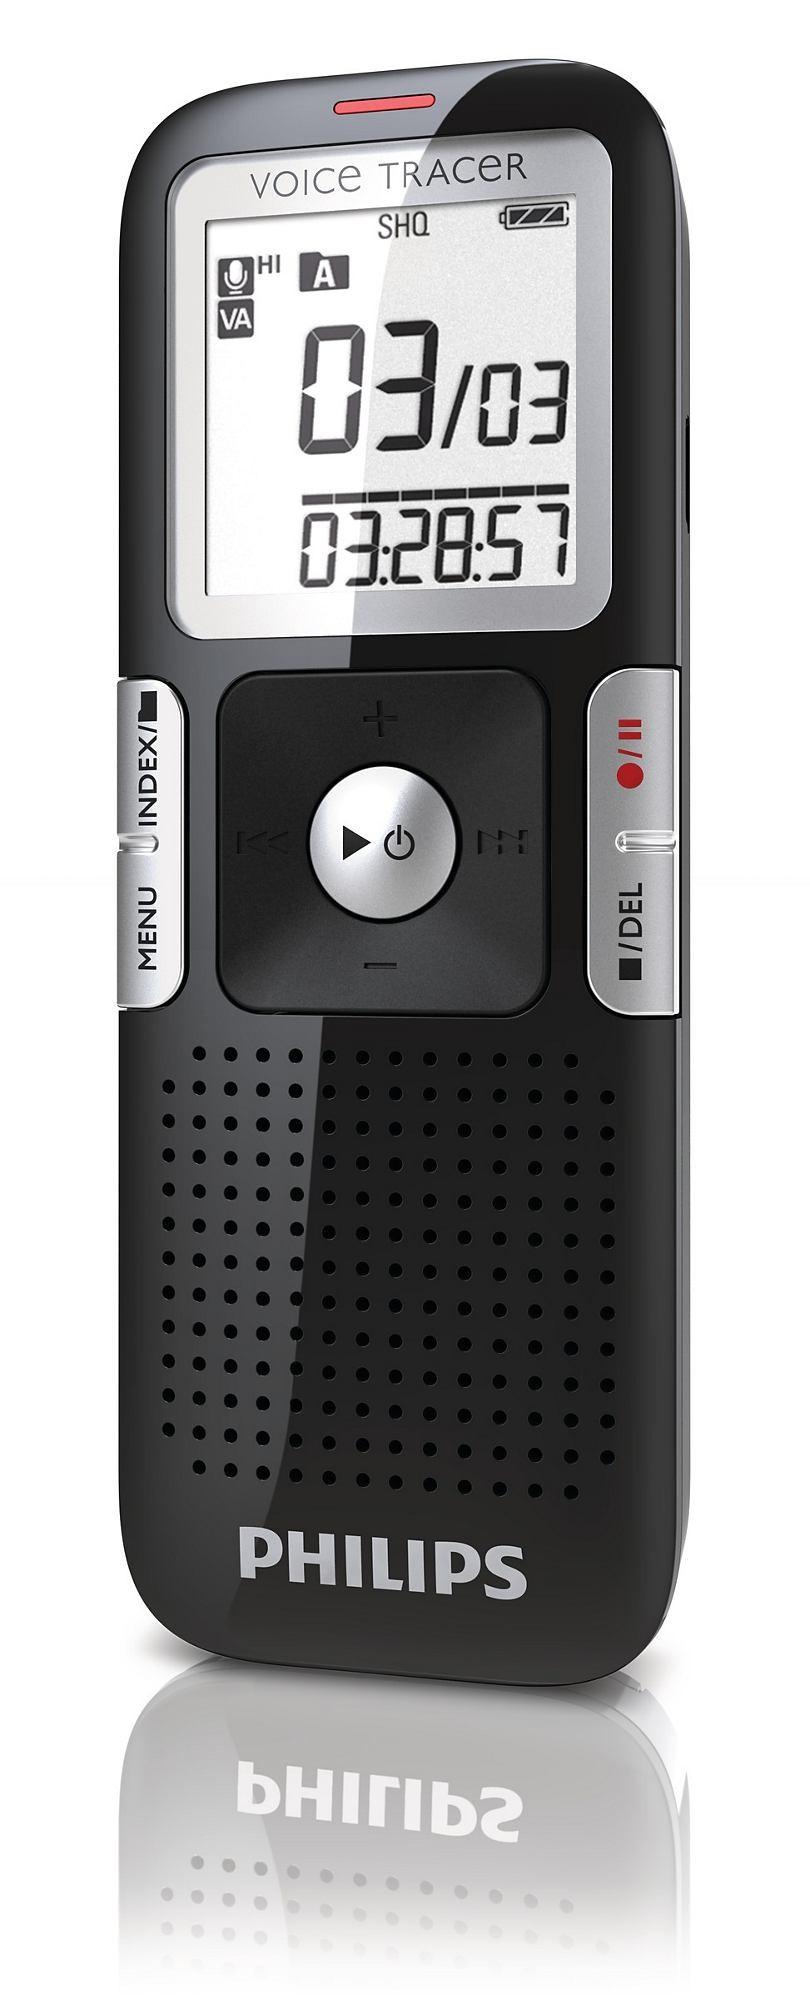 Philips LFH0645 Voice Tracer digital diktafon